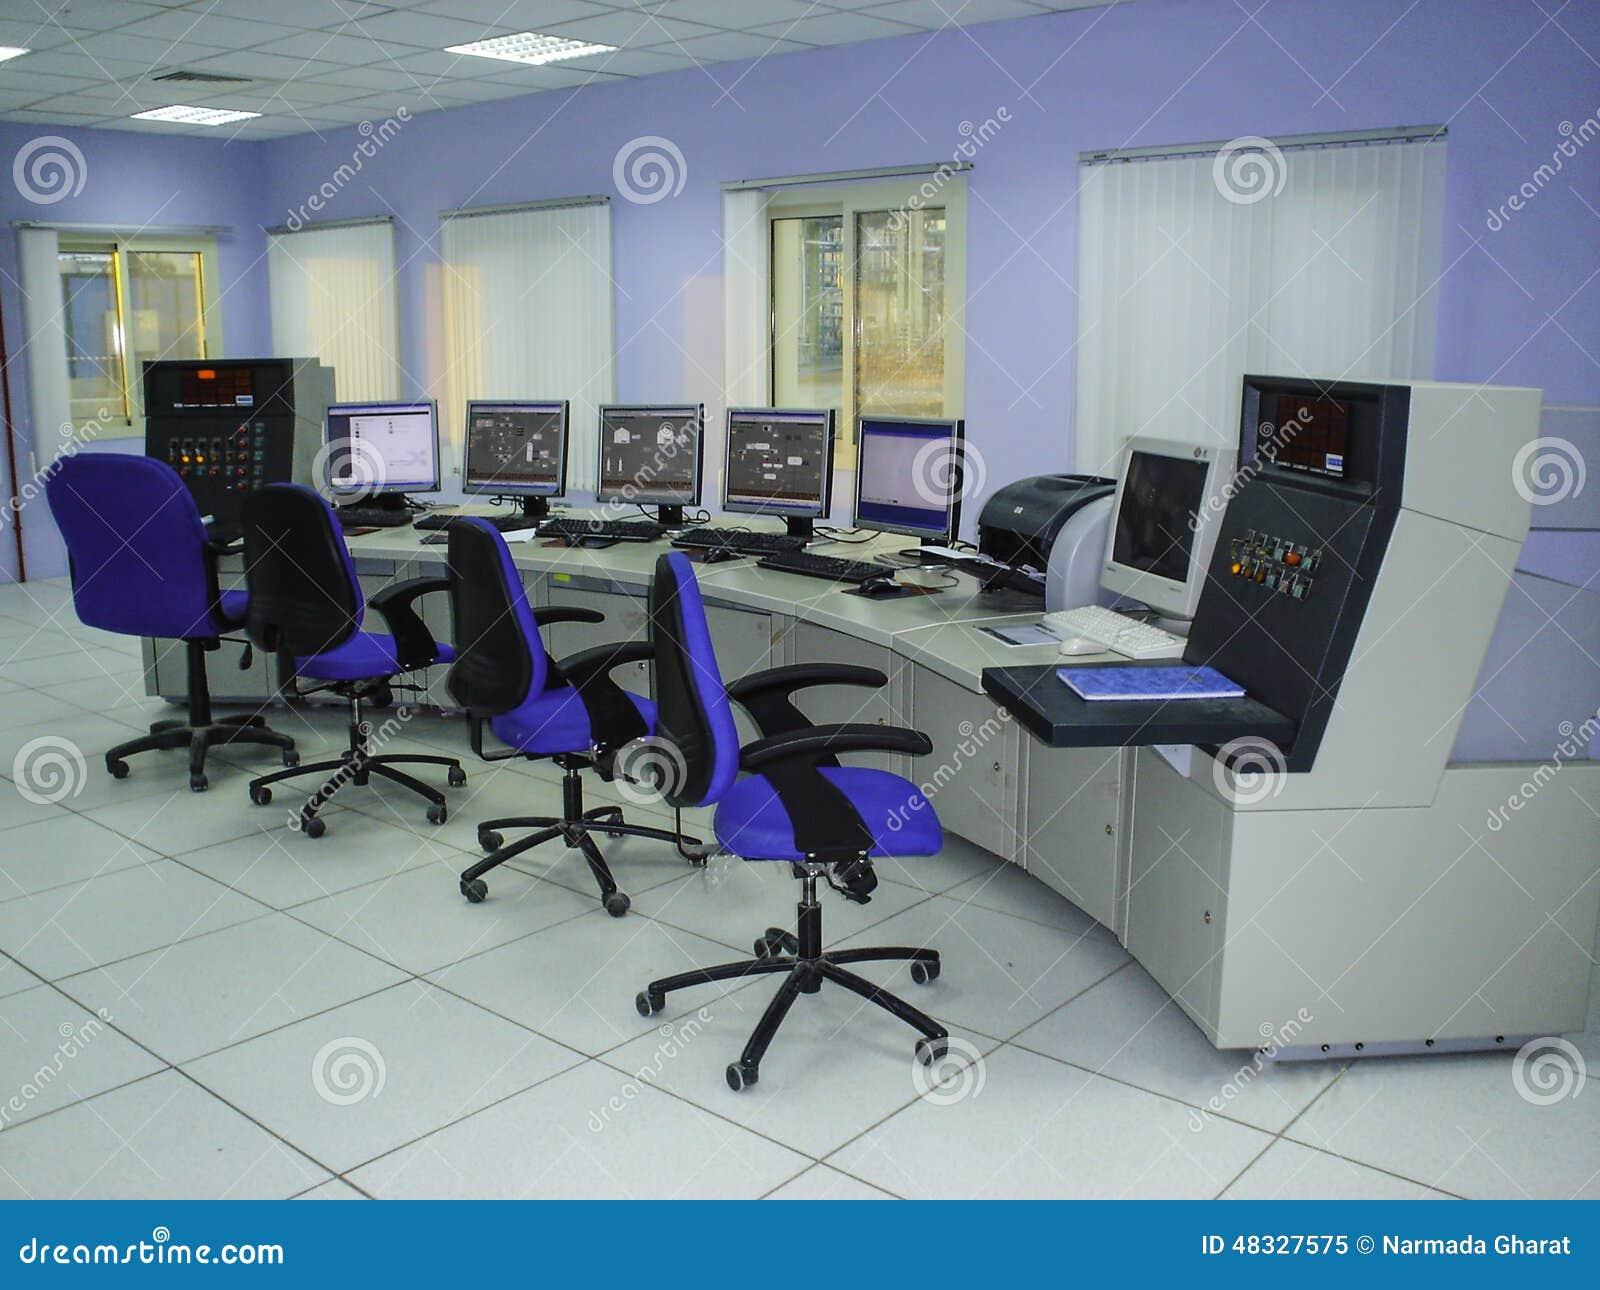 Emergency Control Room Operator